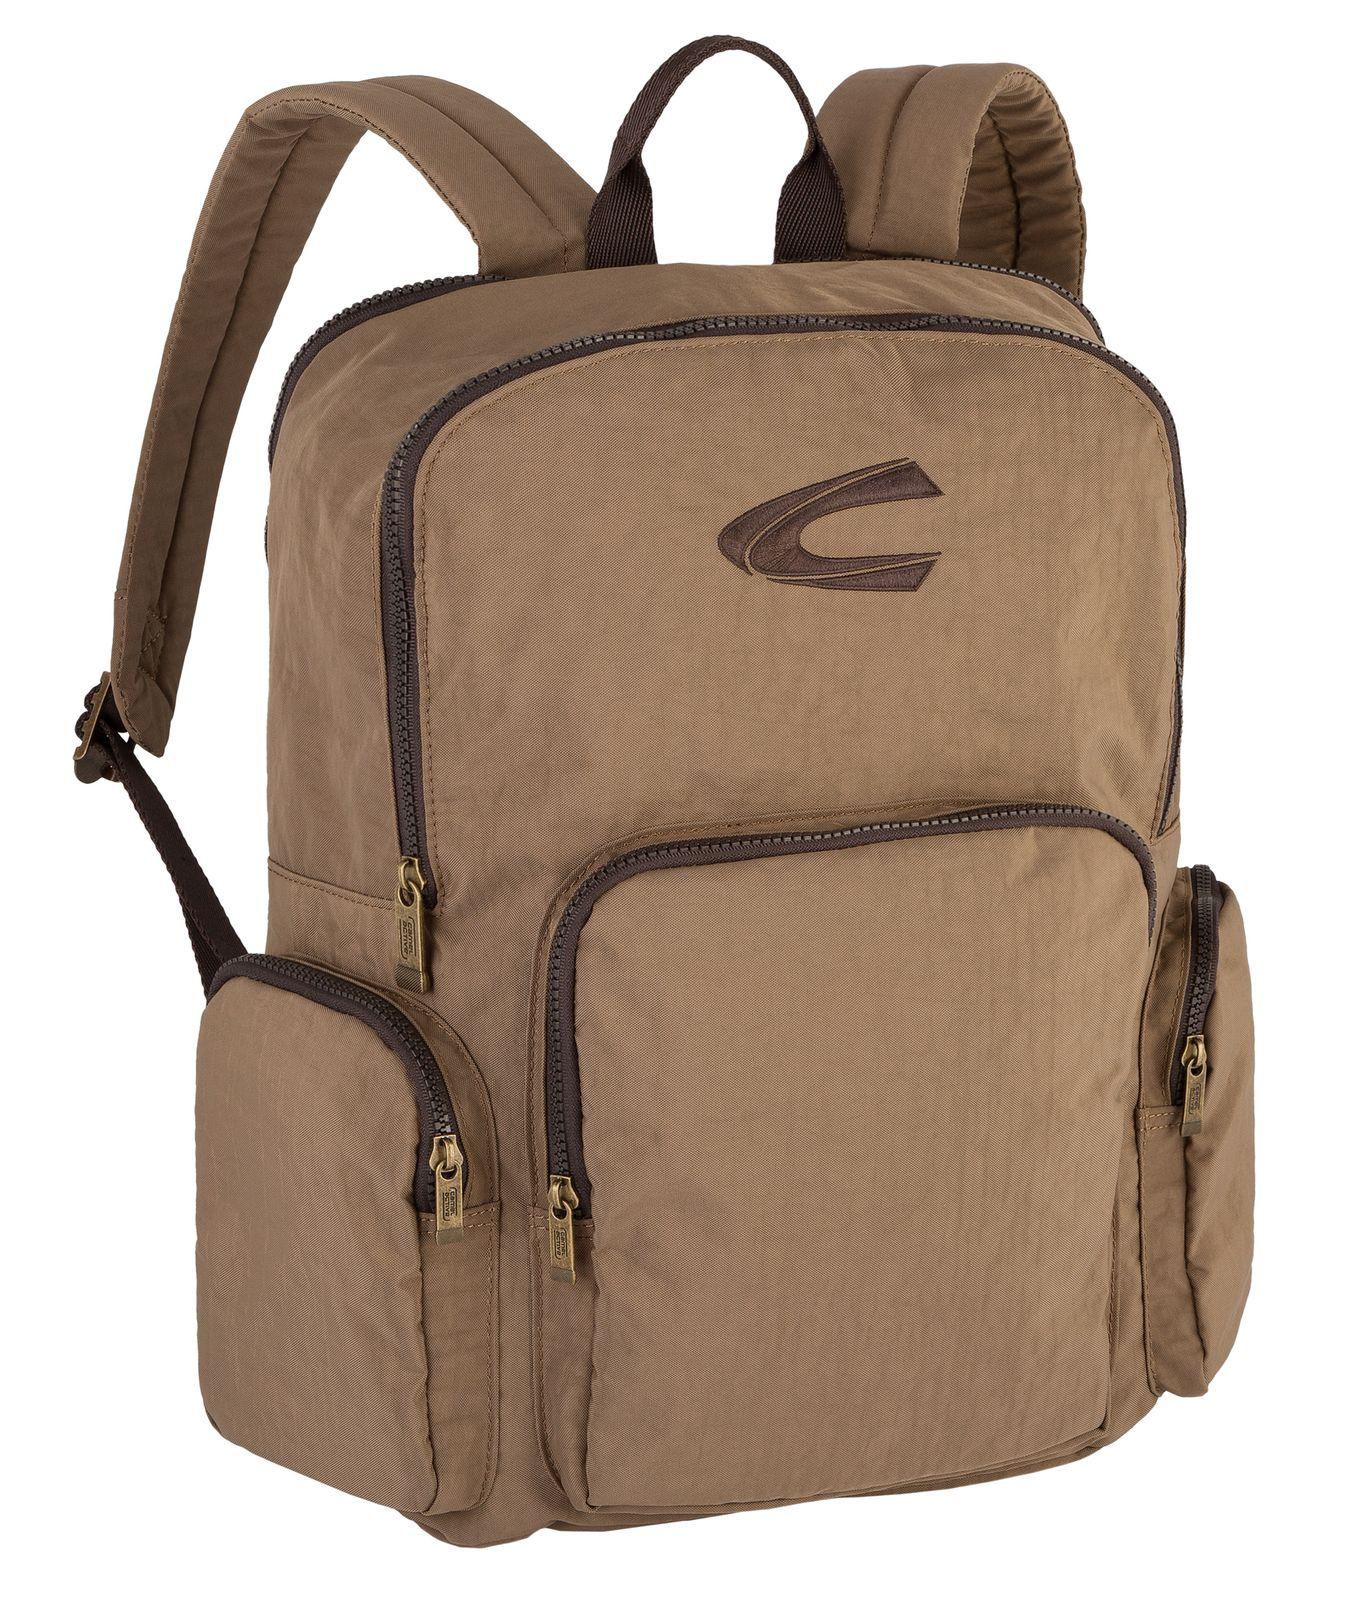 Camel Active Backpack Tasche Rucksack Journey Braun Sand